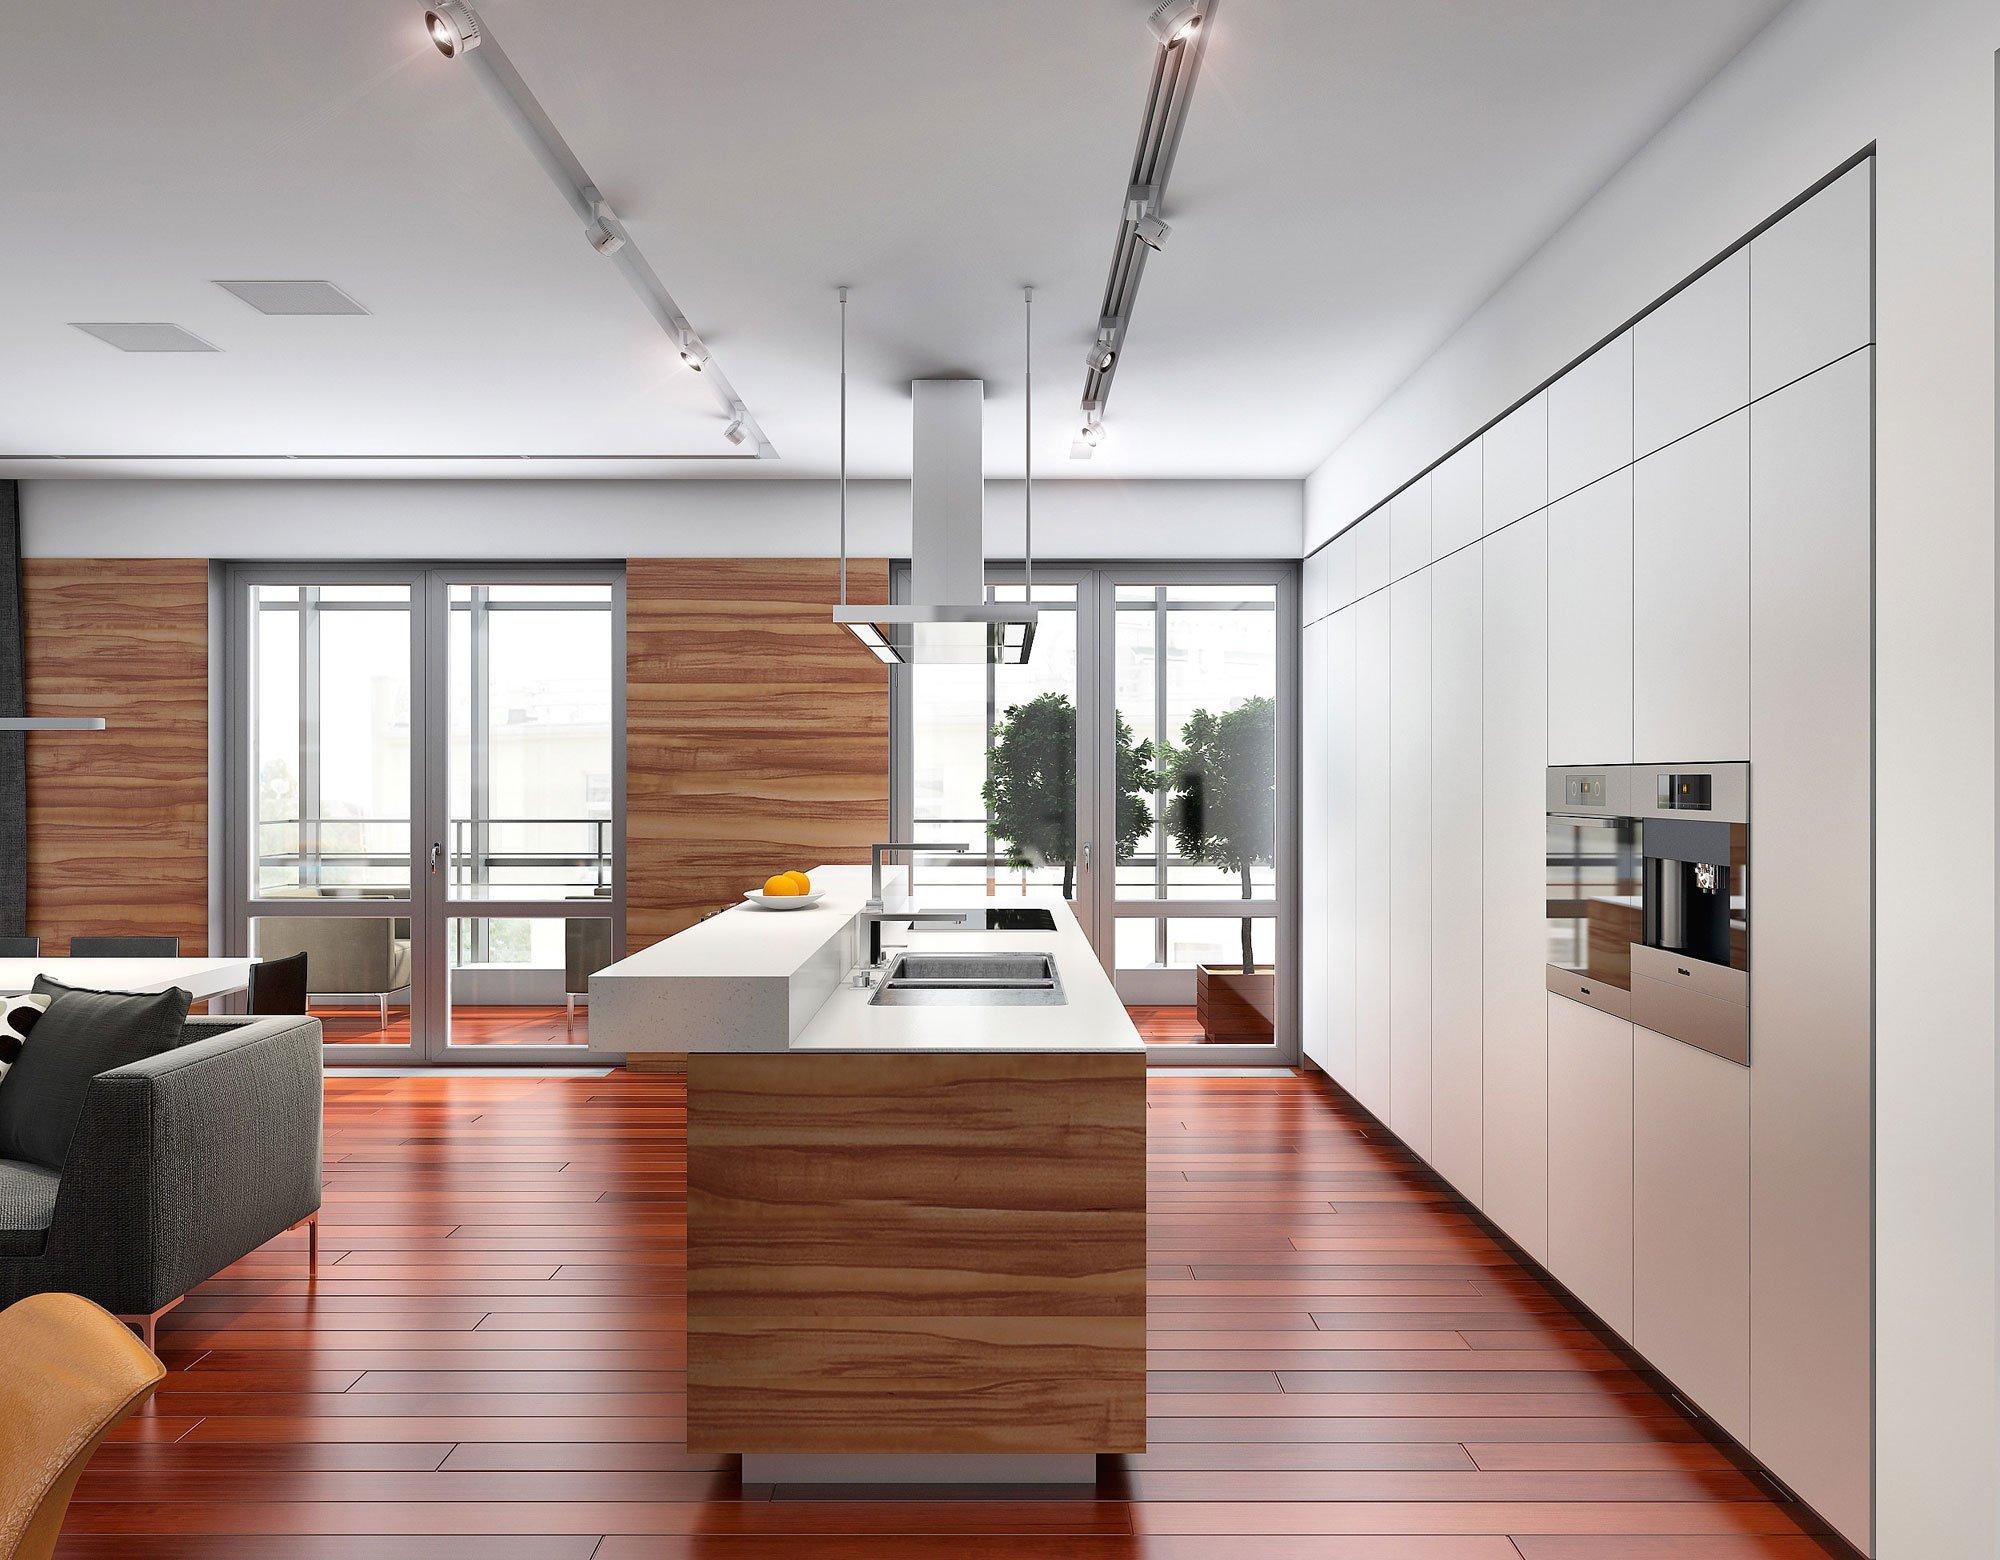 Plano de departamento de tres dormitorios for Cocinas modernas para departamentos